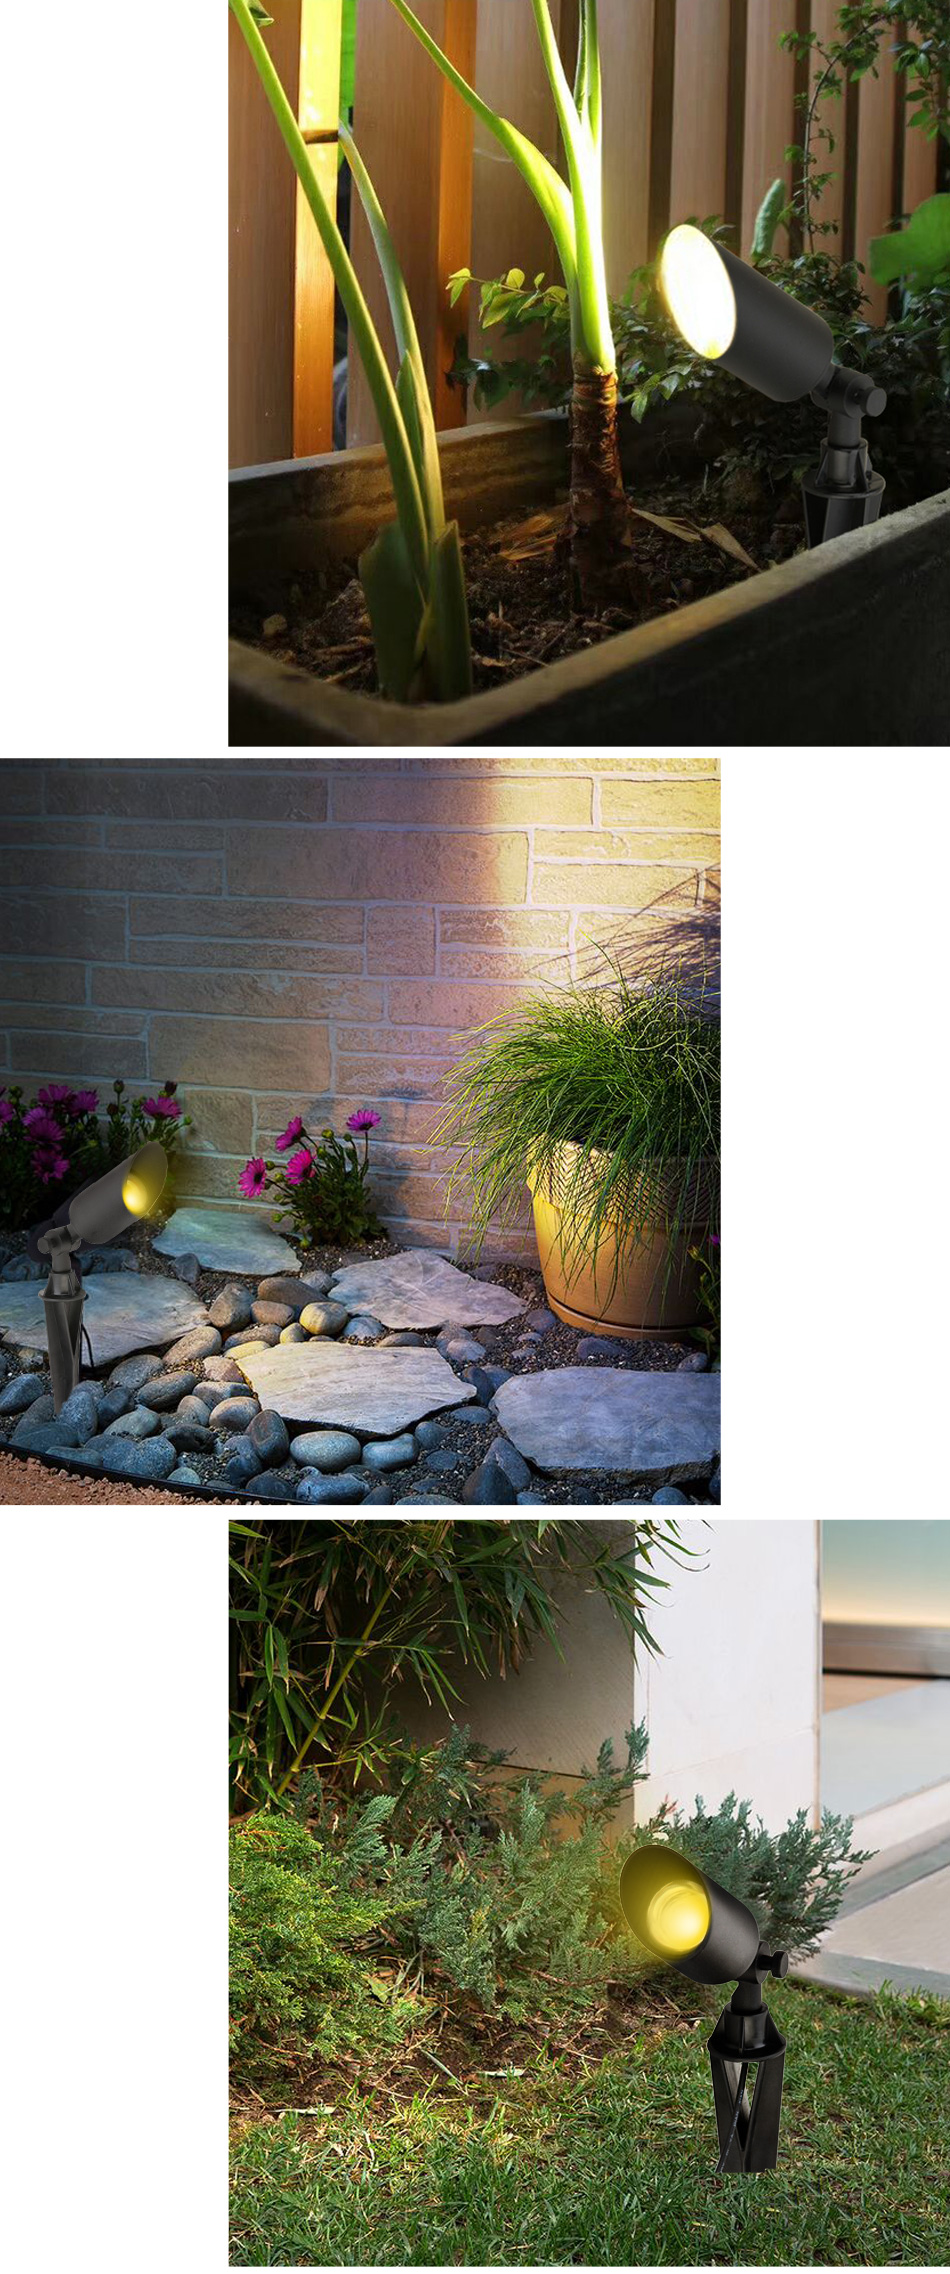 Garden Lights Outdoor Lawn Lamp LED Waterproof Spike Light CREE GU10 220V 110V for garden and backyard decoration yard christmas pathway Landscape Spotlight (7)